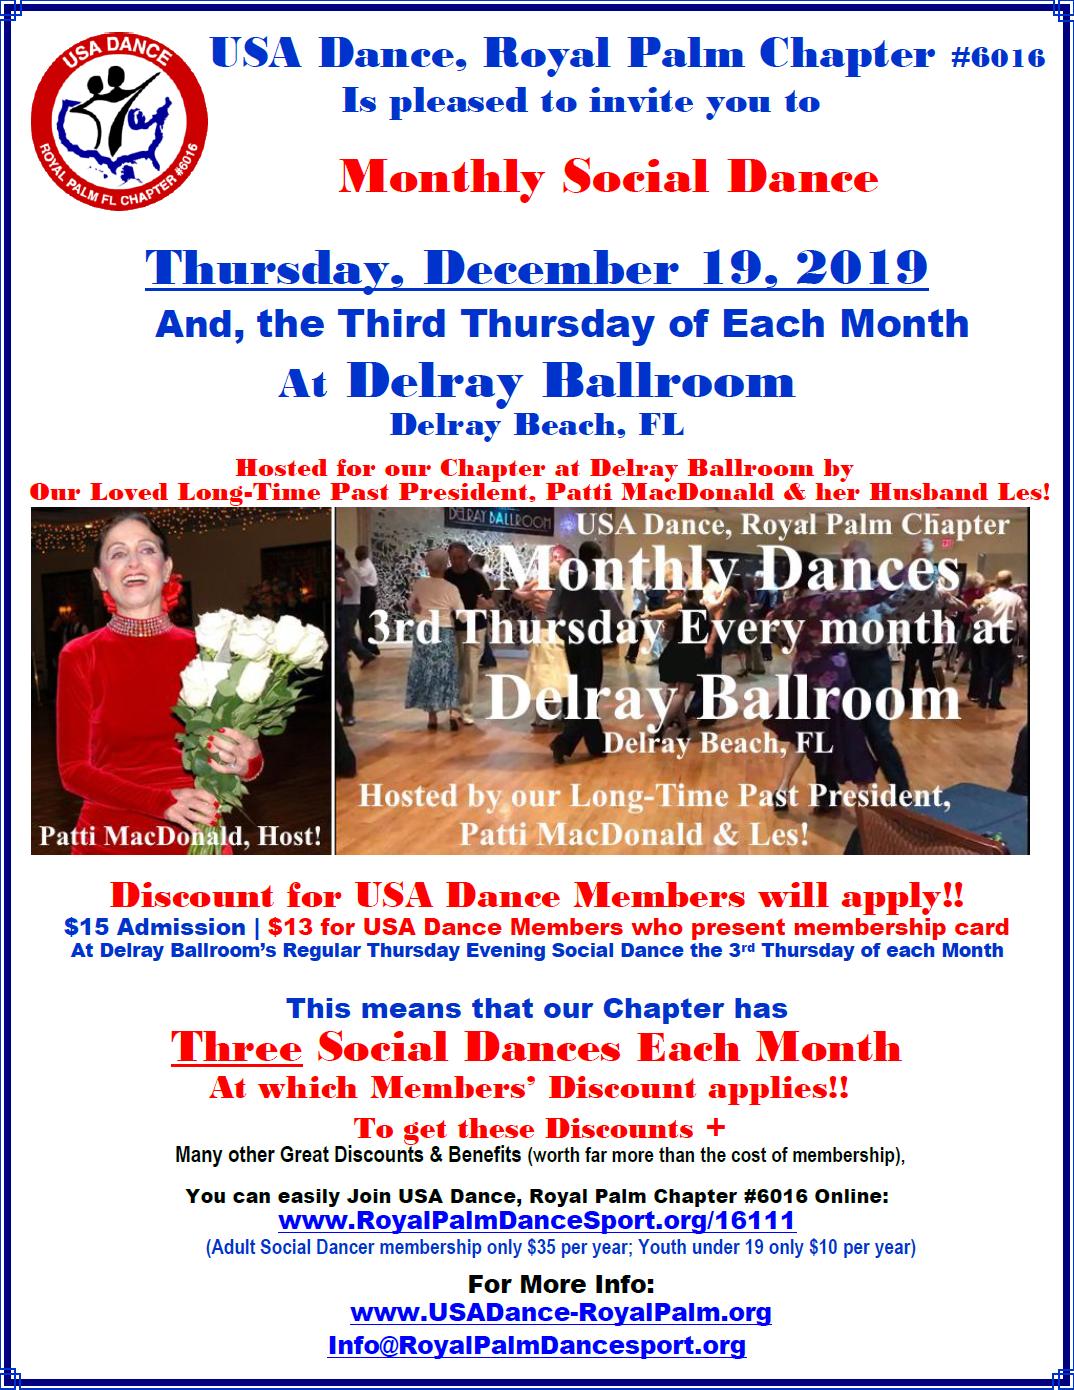 December 19, 2019 - Royal Palm Chapter Social Dance at Delray Ballroom